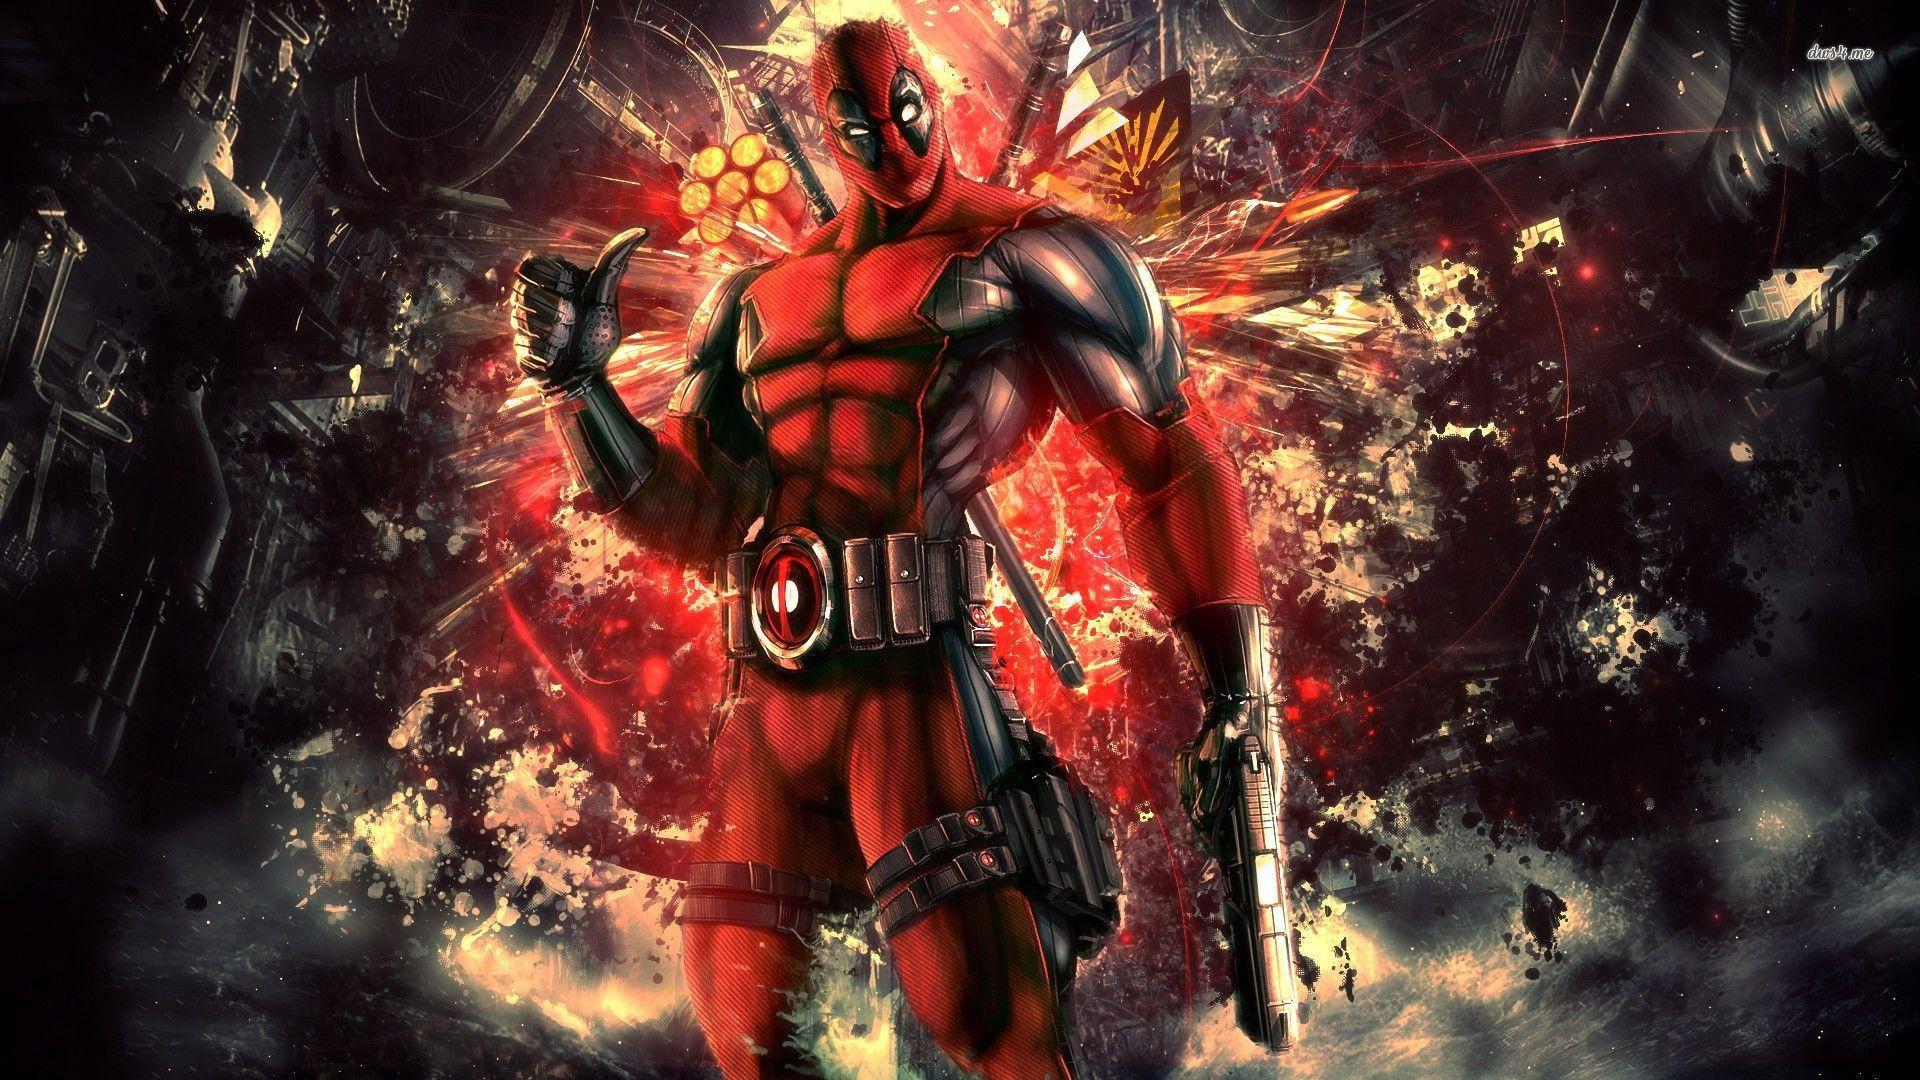 1000 Ideas About Deadpool Hd Wallpaper On Pinterest: Deadpool HD Wallpapers For Desktop Download